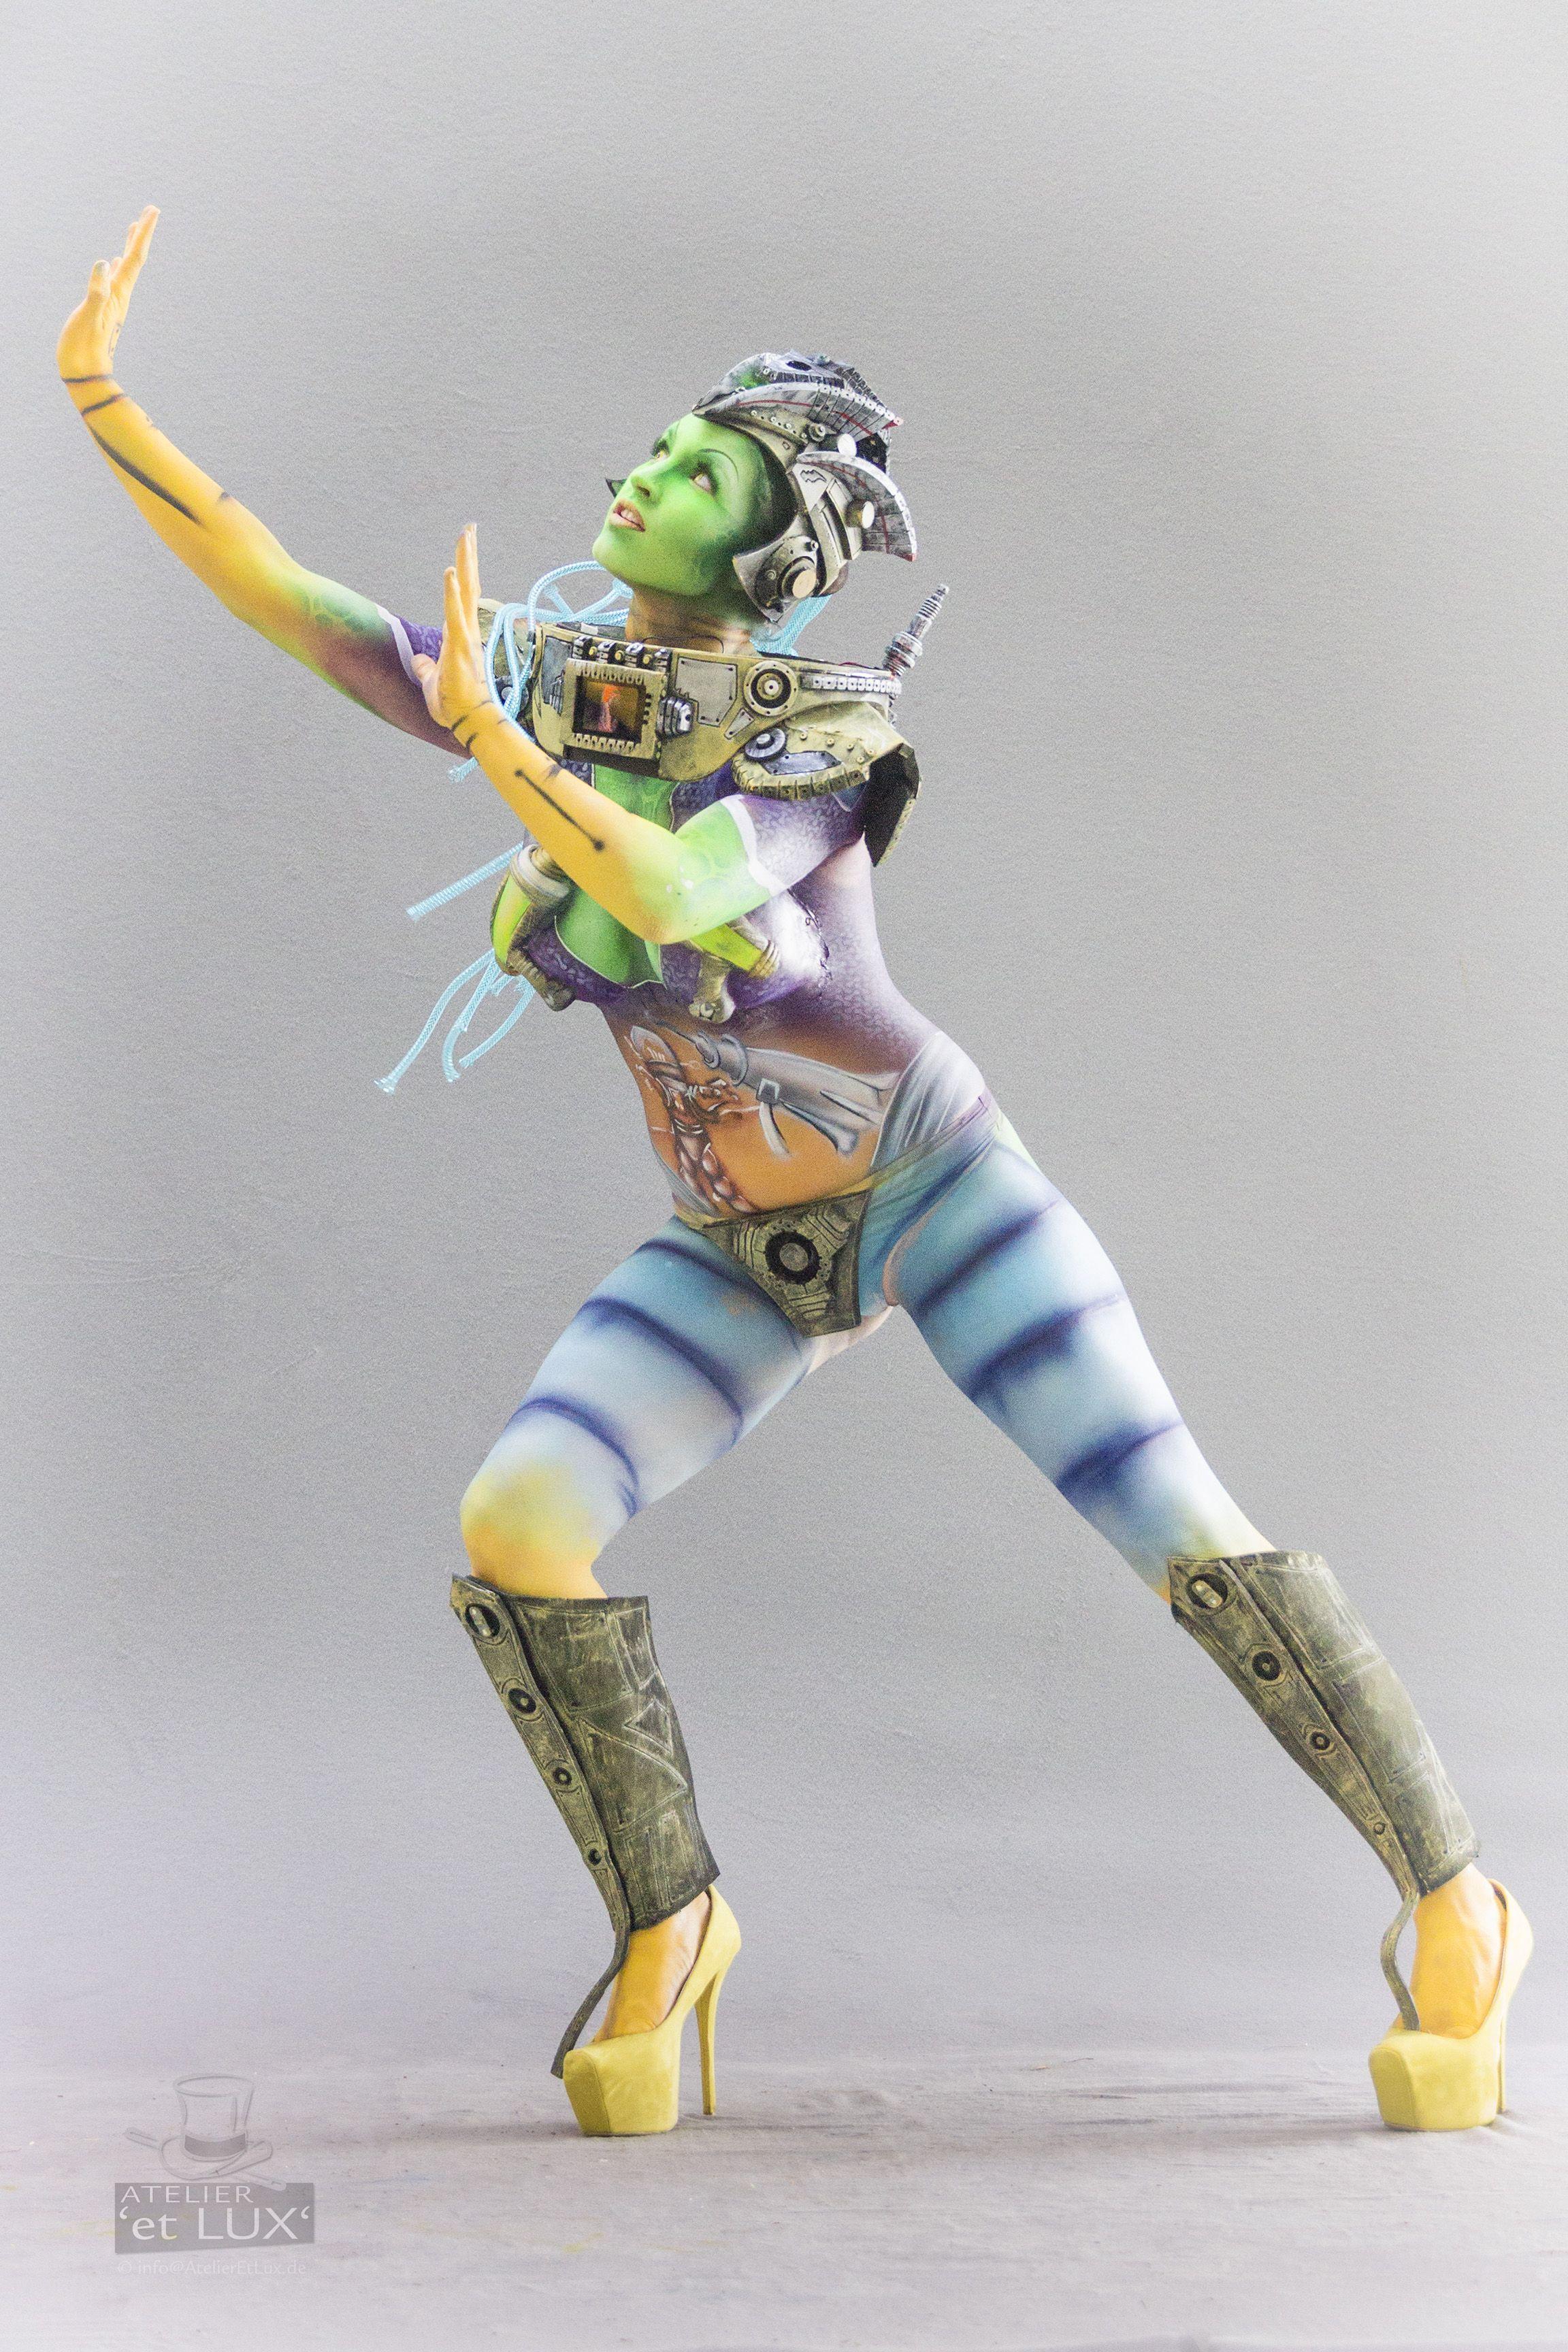 WBF 2014 | SFX Bodypainting Qualification 'Pop Art'  Photography: Atelier 'et Lux' (Eve Lumière), Artist ID222: Rudy Campos - USA